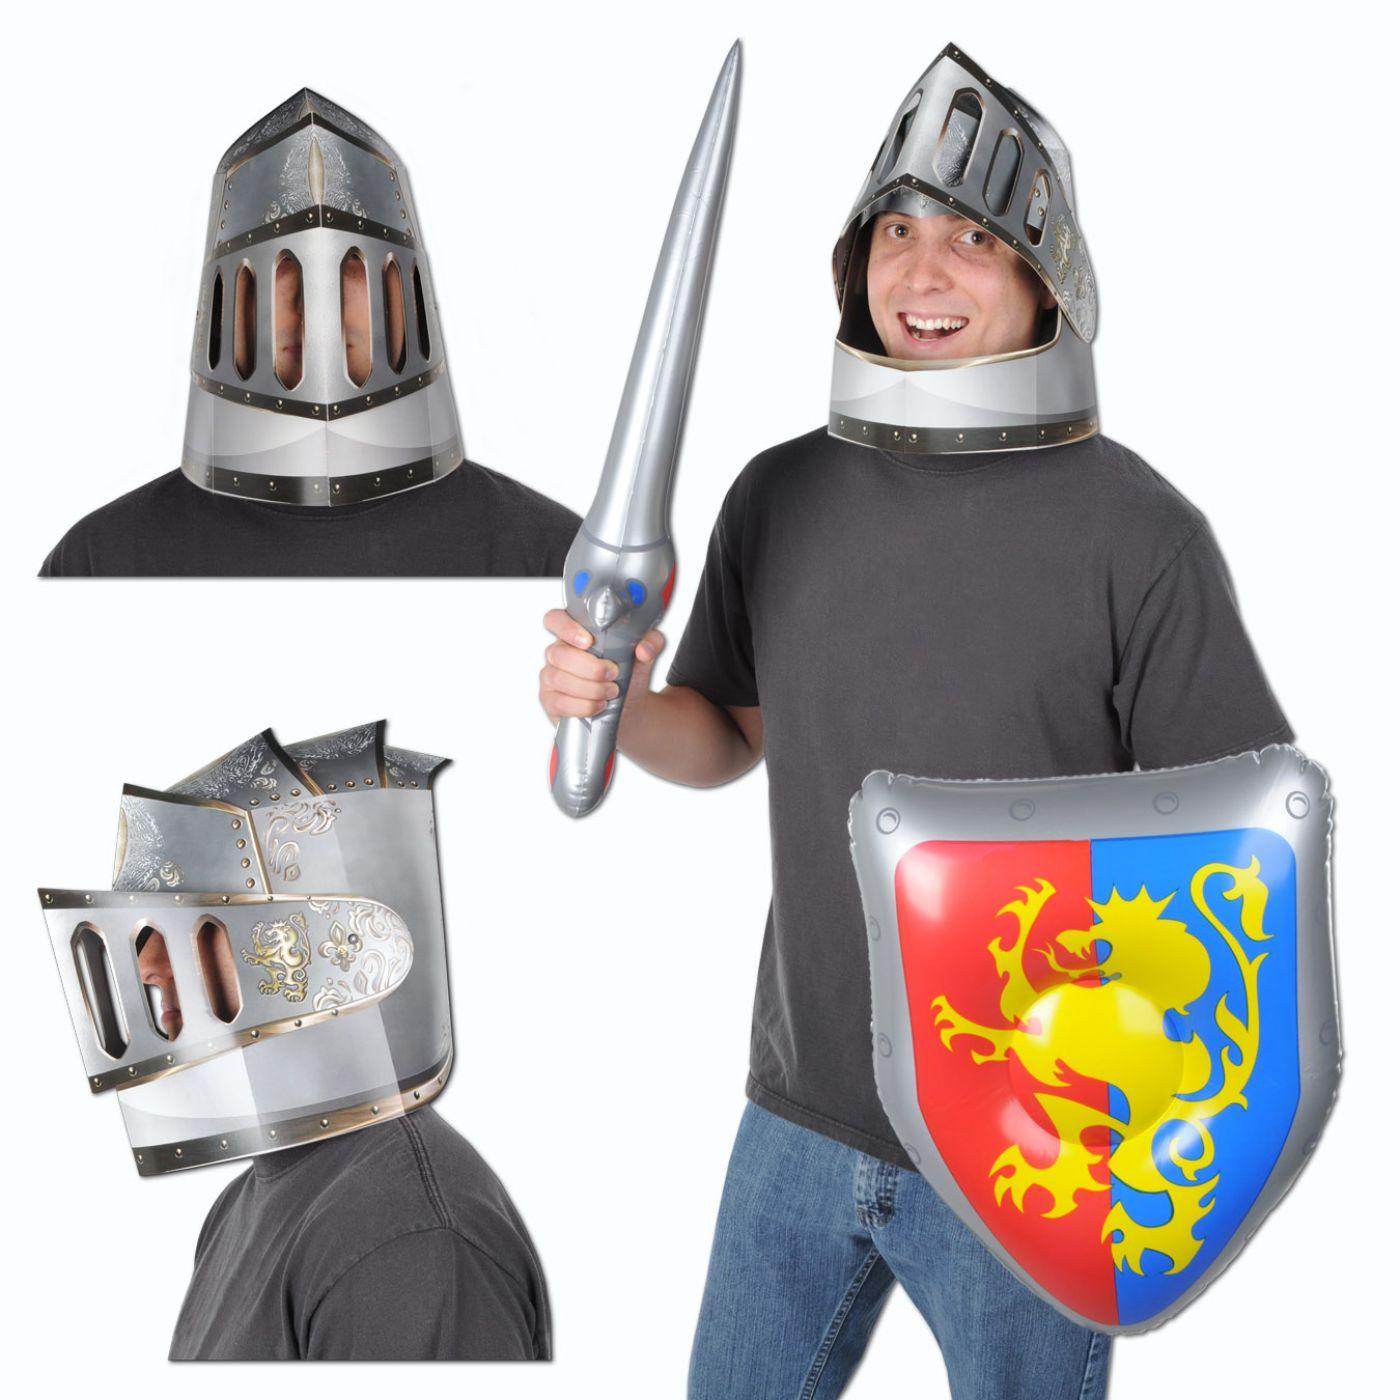 Paperboard Knight's Helmet image